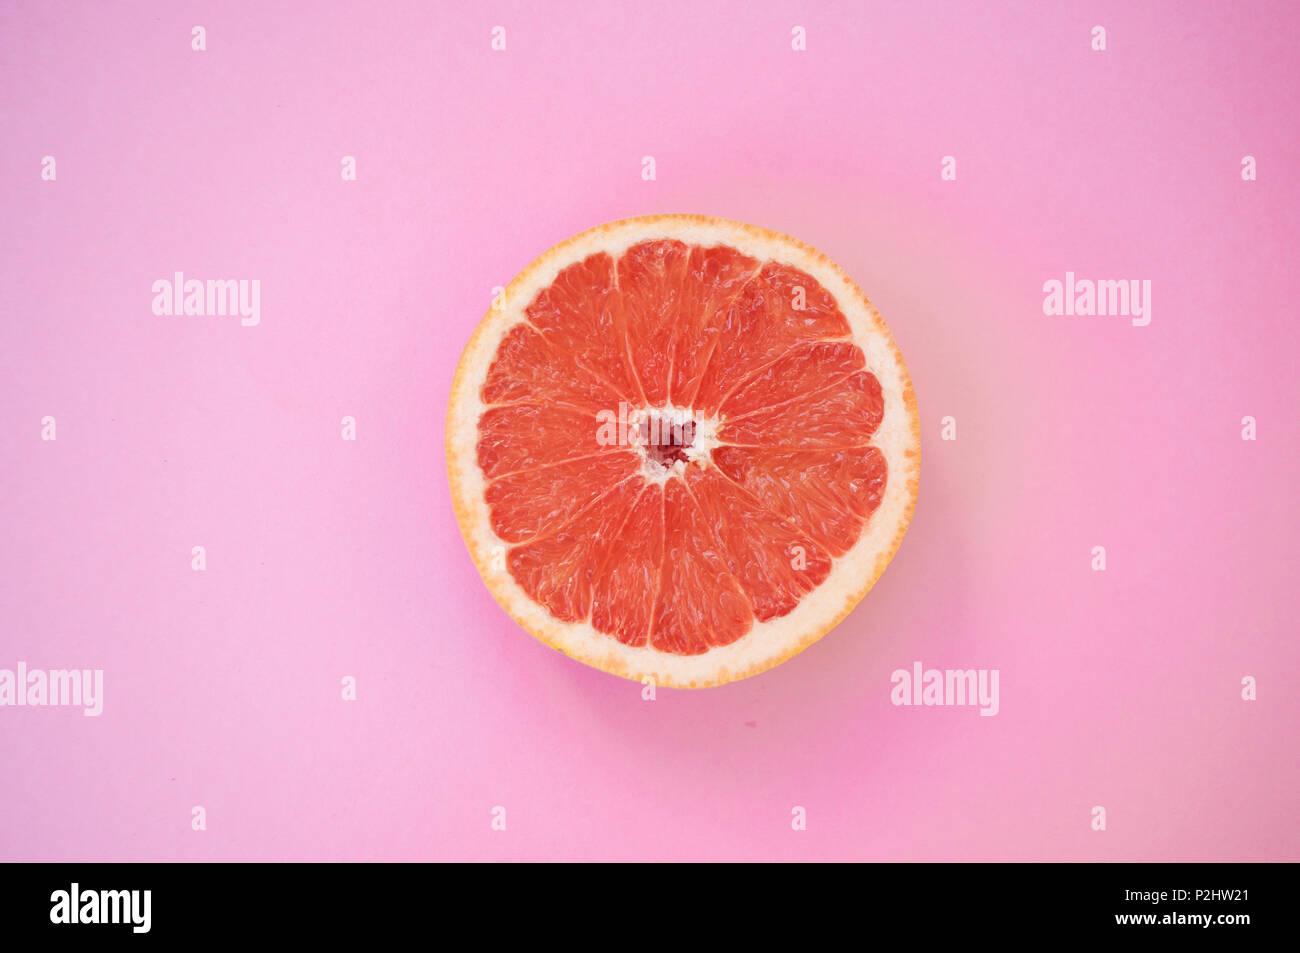 Beautiful juicy cut grapefruit on pastel pink background. - Stock Image